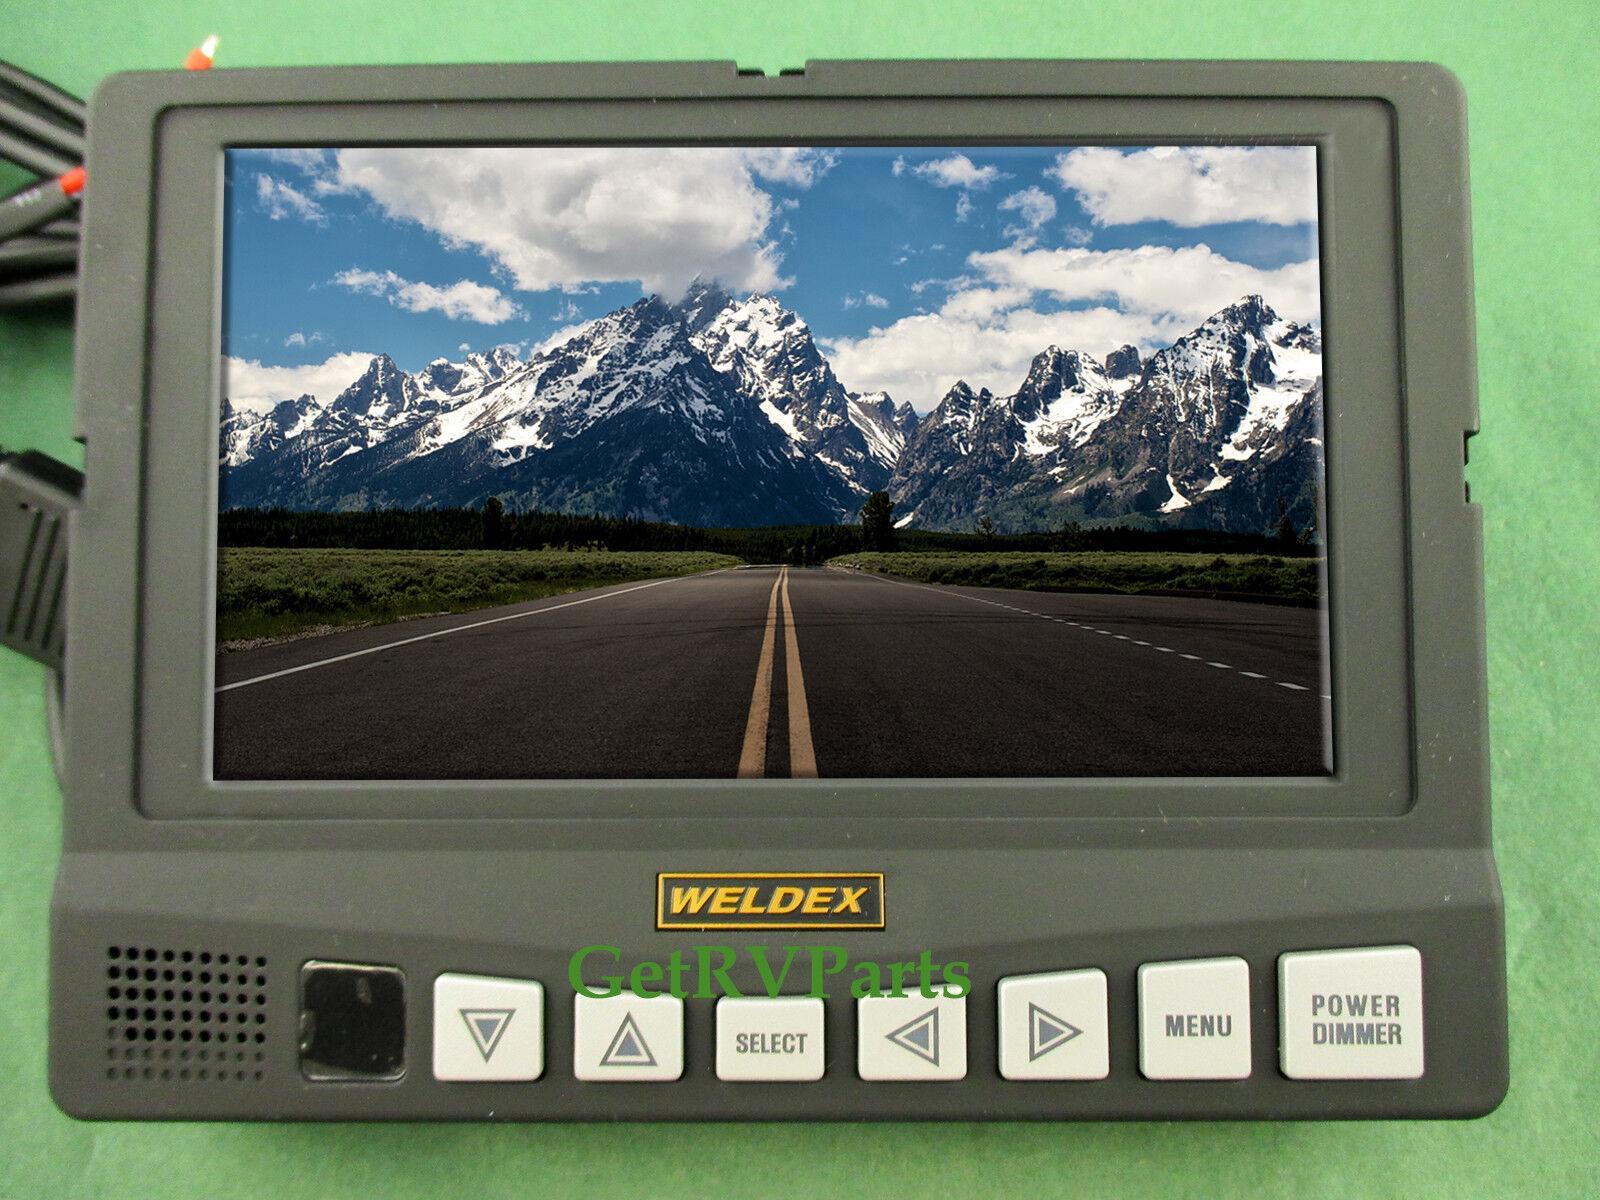 weldex wiring diagram weldex wdrv 7041m upm rear view lcd color monitor 7  for sale  weldex wdrv 7041m upm rear view lcd